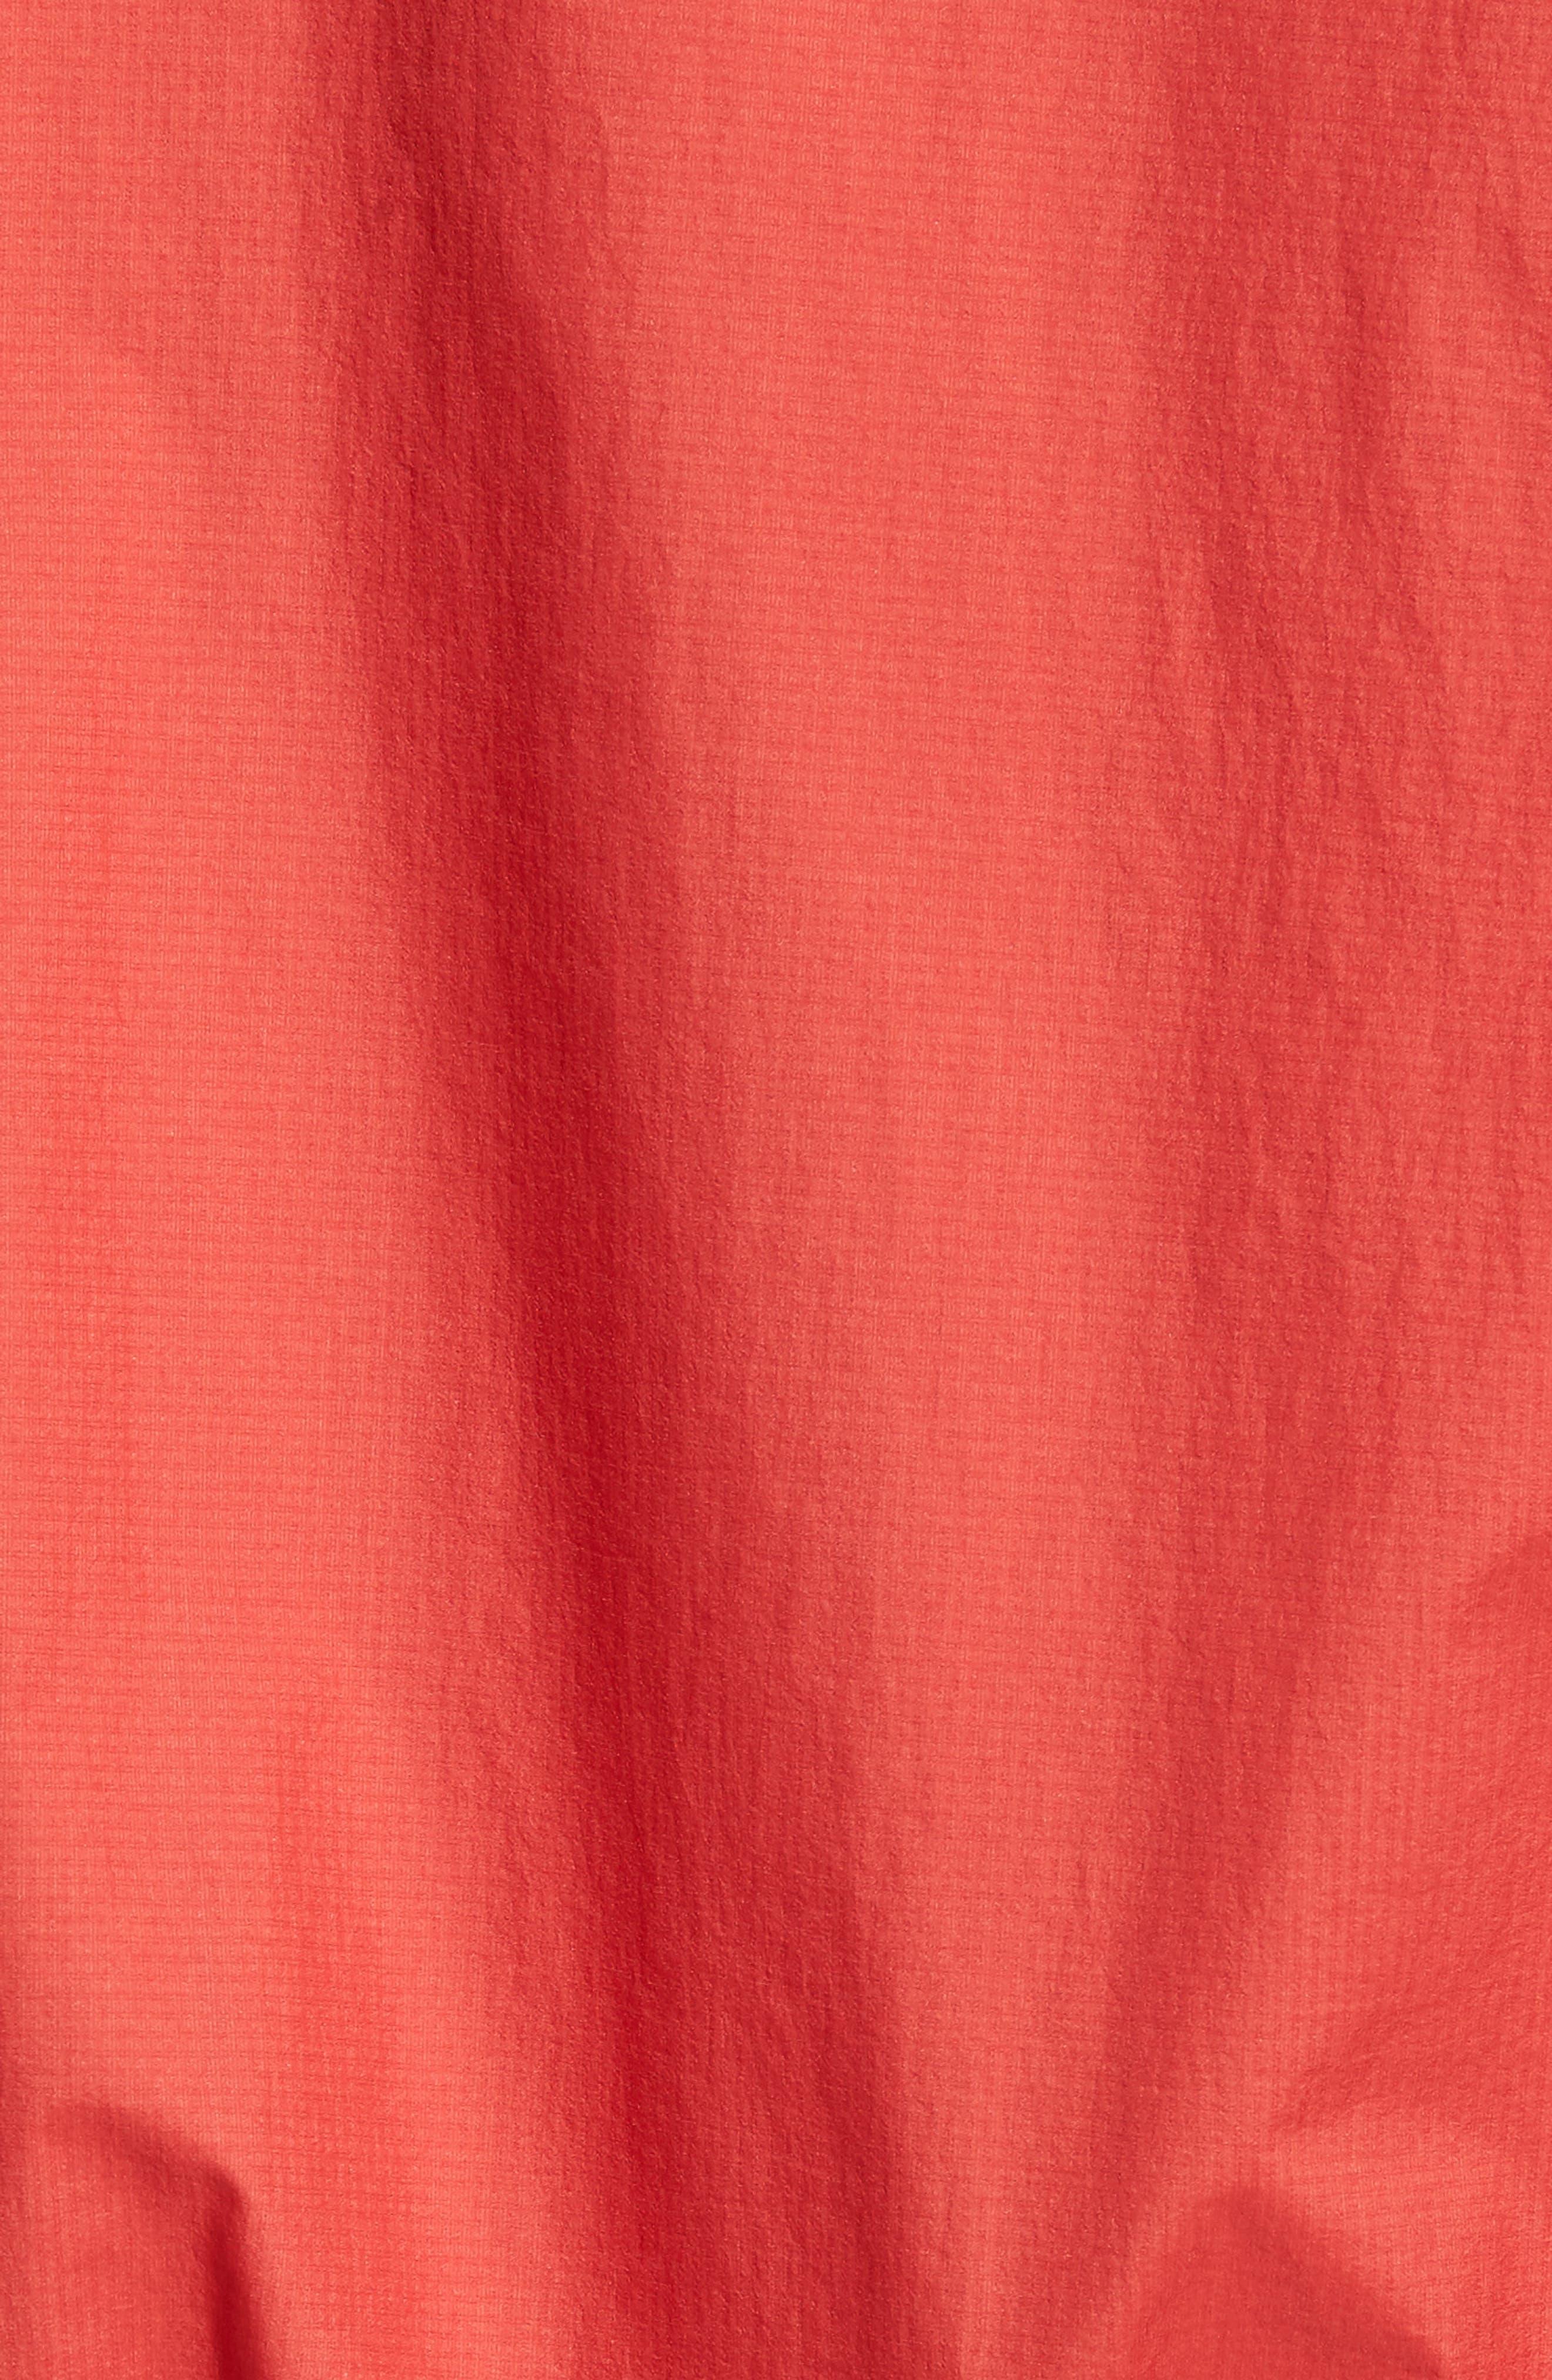 Wallaby Bomber Jacket,                             Alternate thumbnail 6, color,                             646